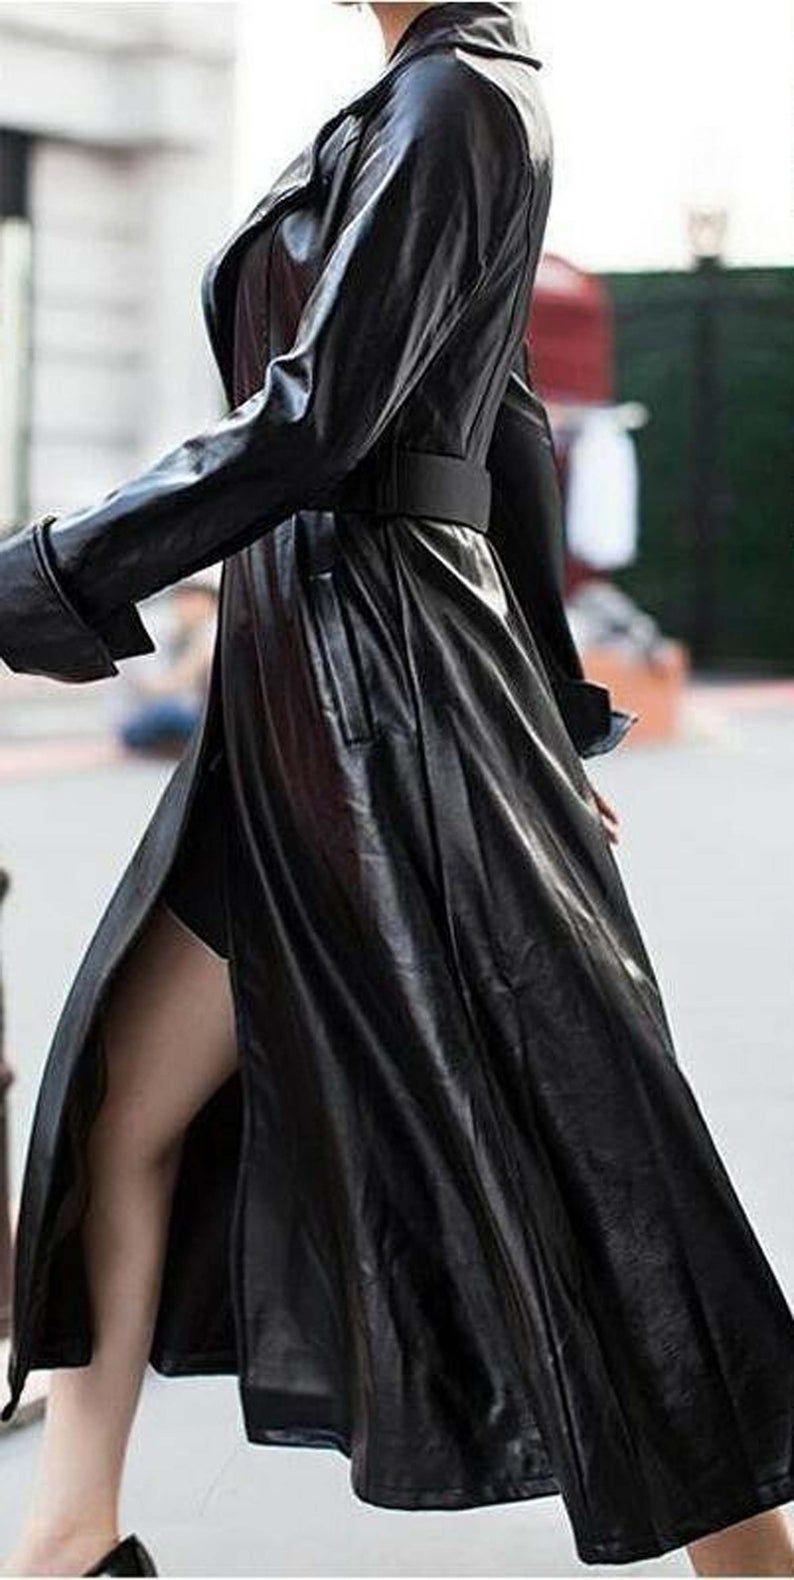 NOORA NEW HEAVY Black Leather Trench Coat Women's Genuine